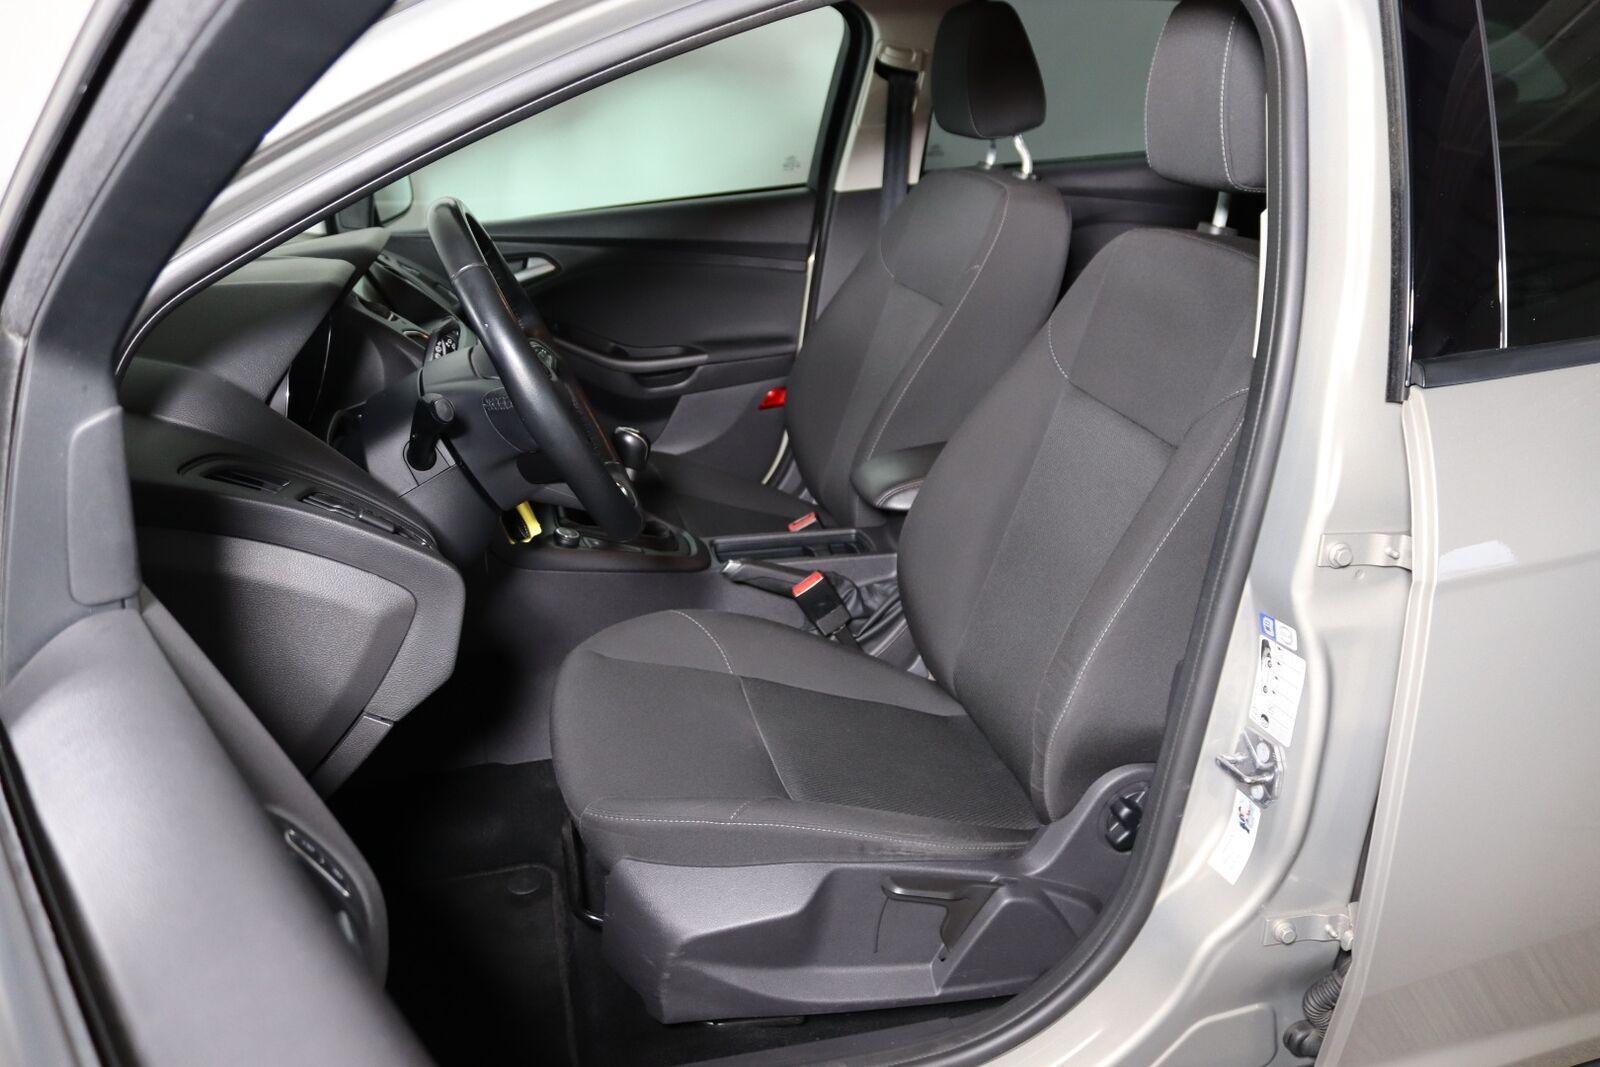 Ford Focus 1,6 TDCi 115 Business stc. - billede 4